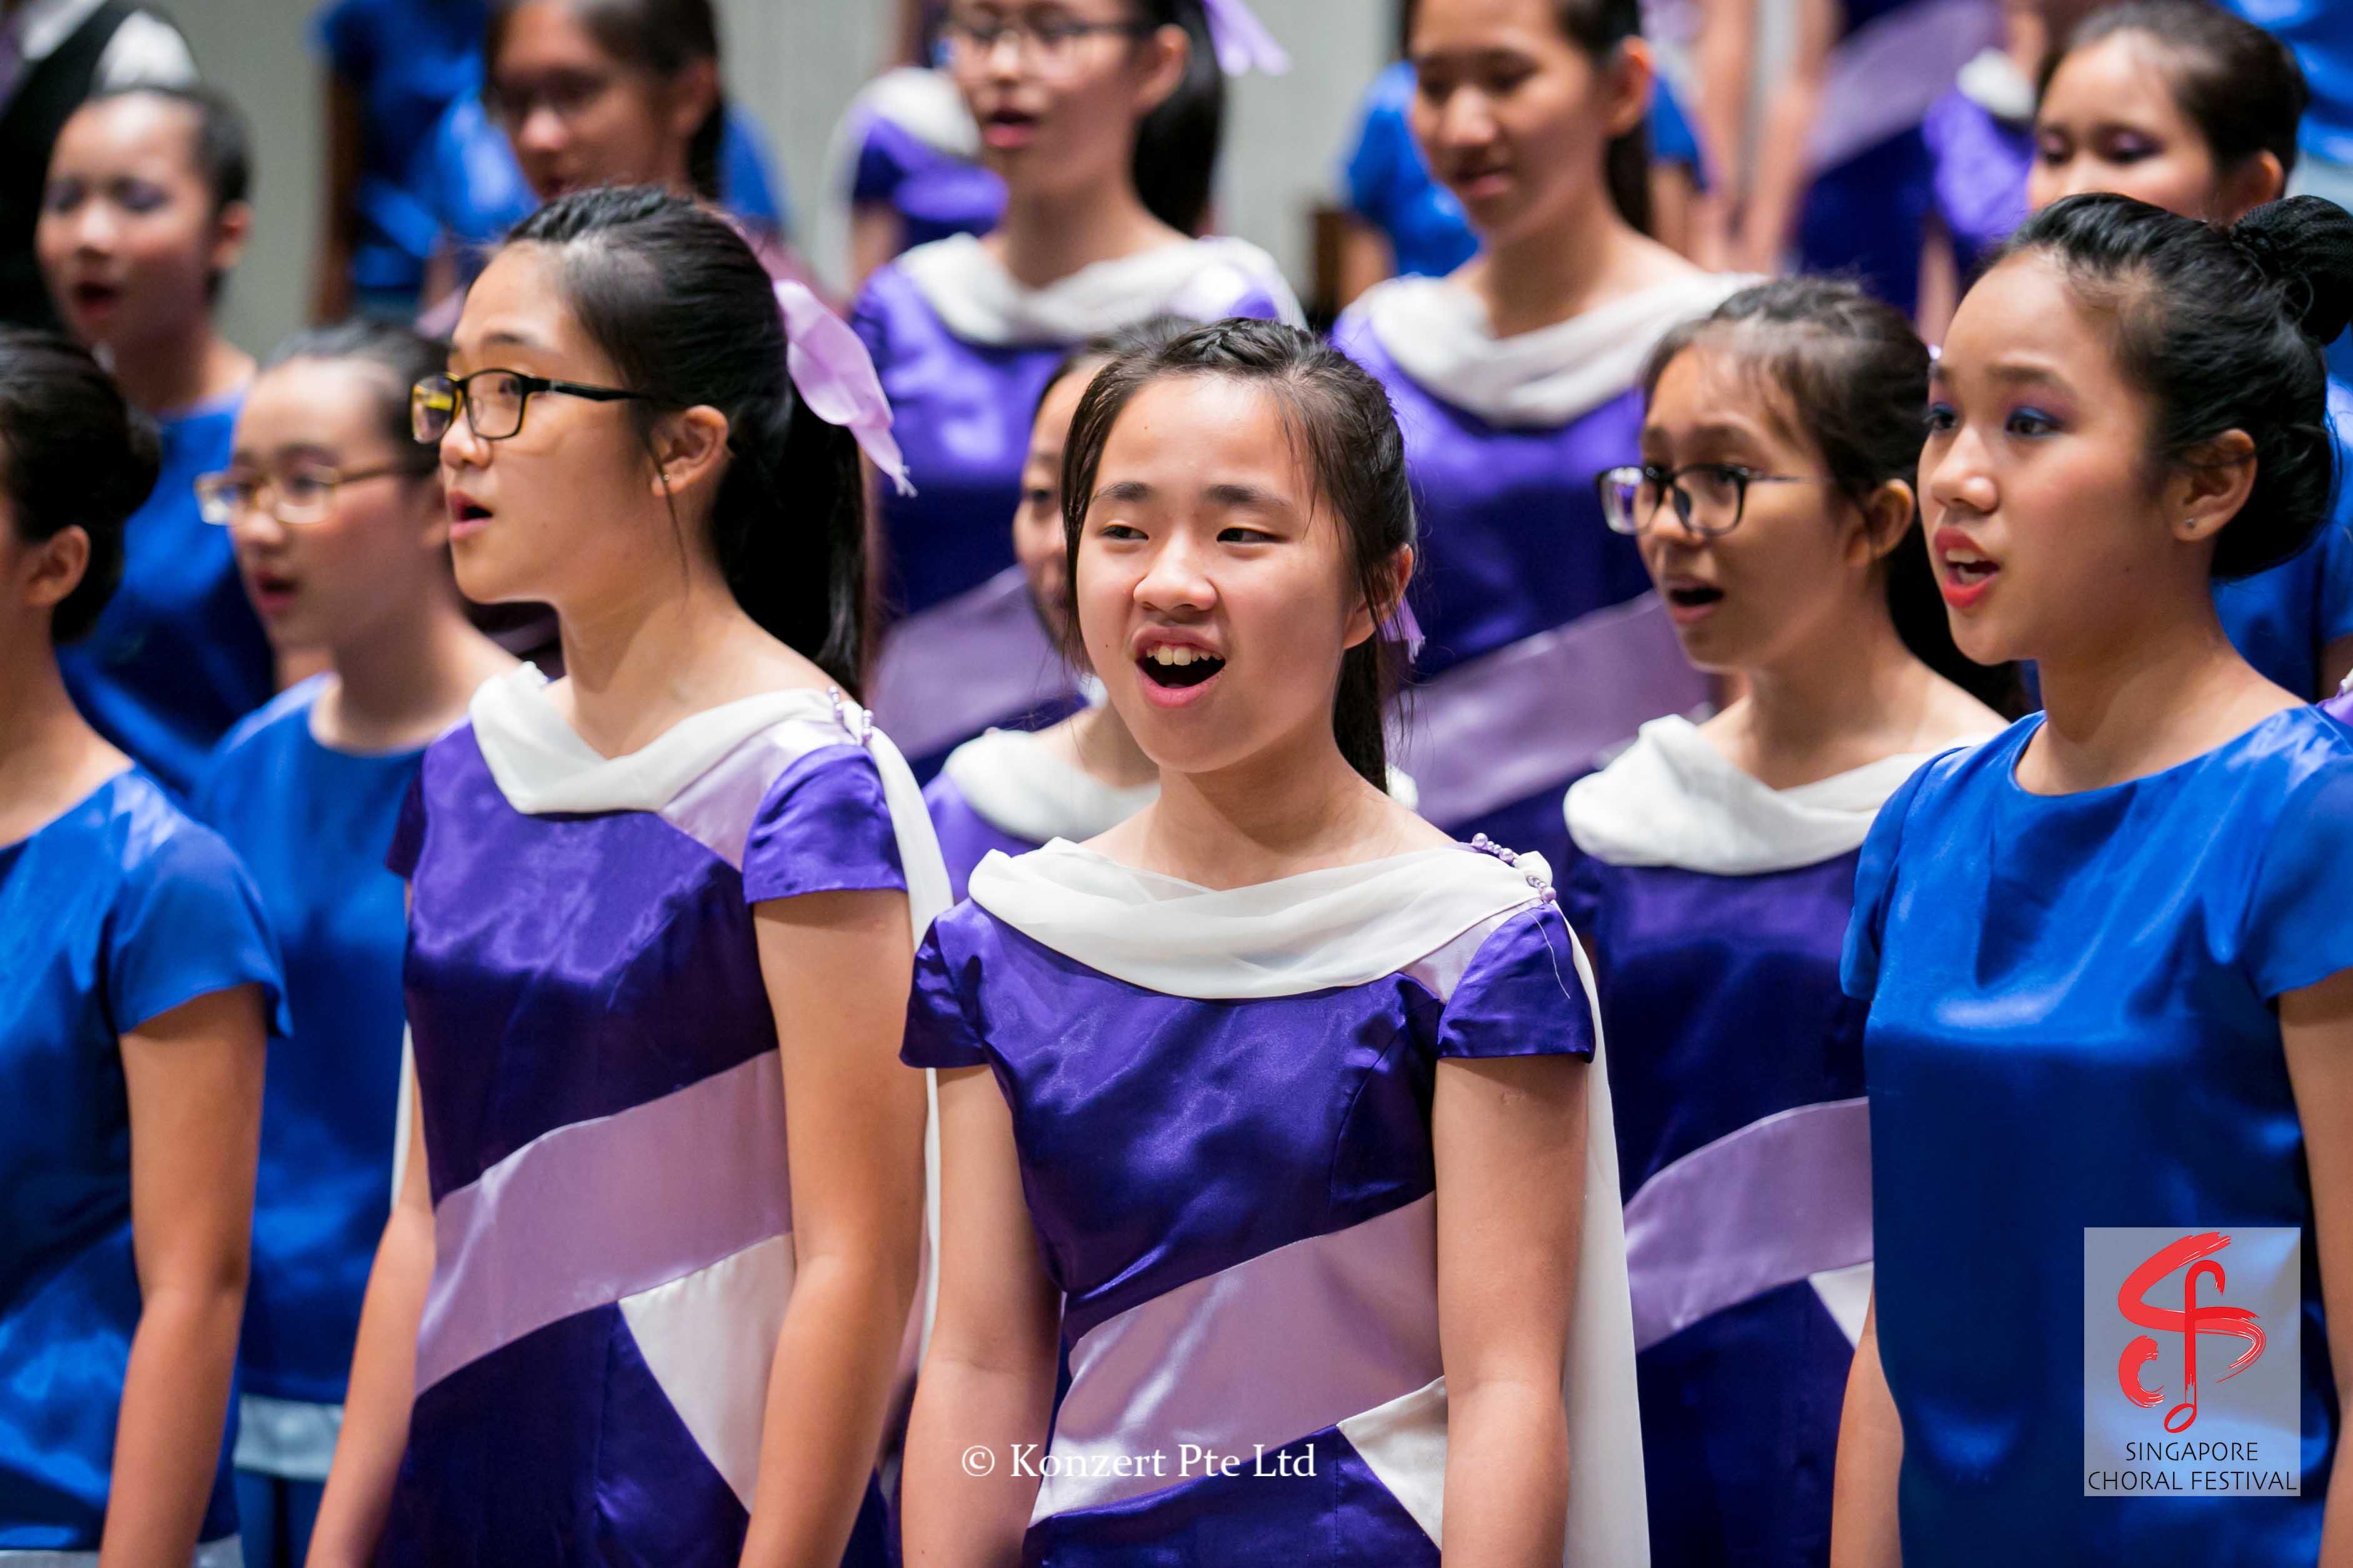 Singapore Choral Festival 7-8-15 (104).jpg